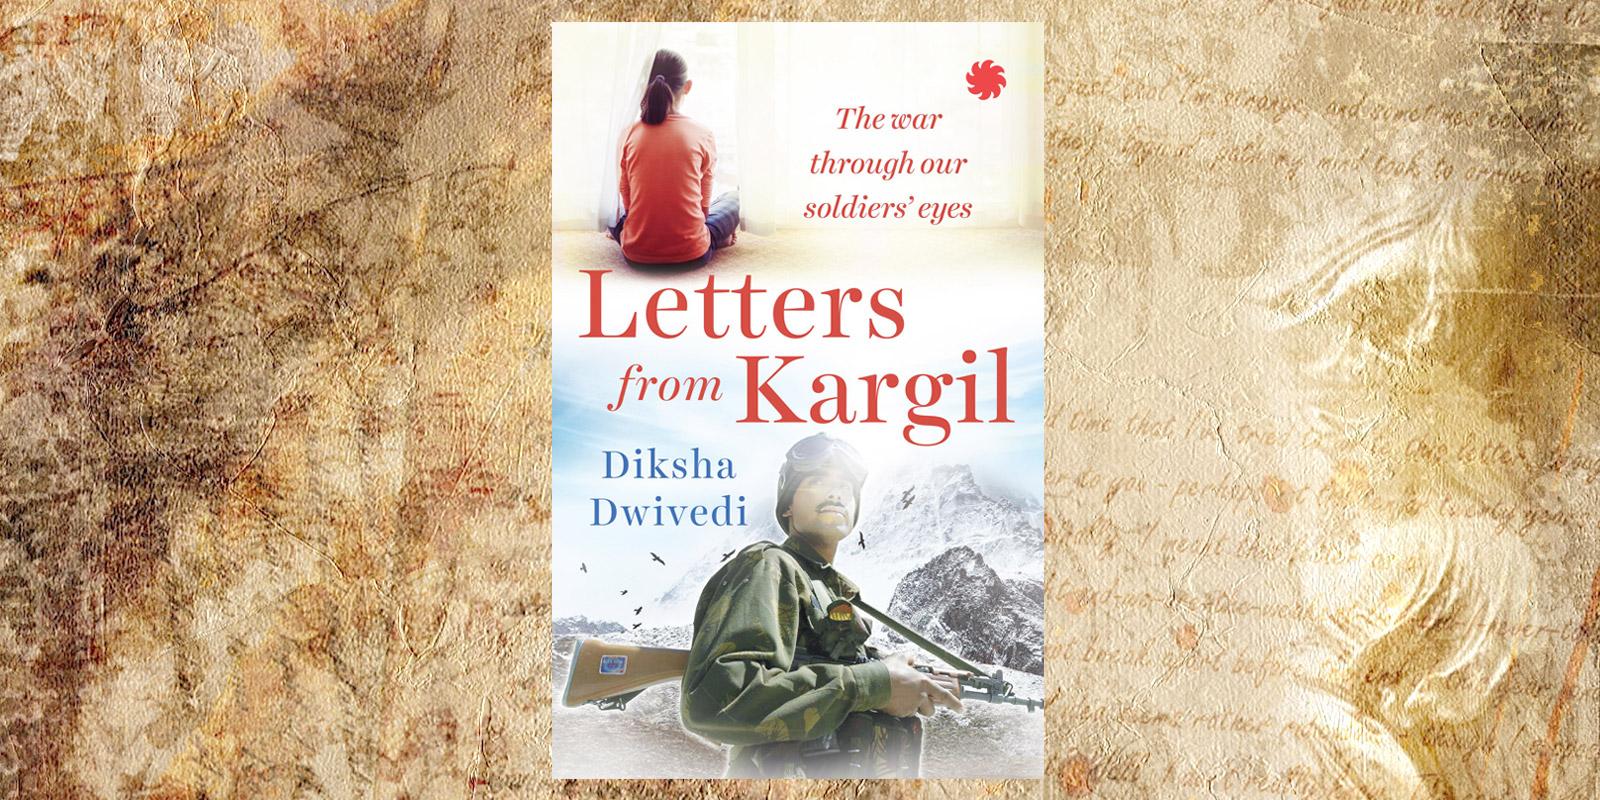 Letters-from-Kargil-by-Diksha-Dwivedi-Book-Review